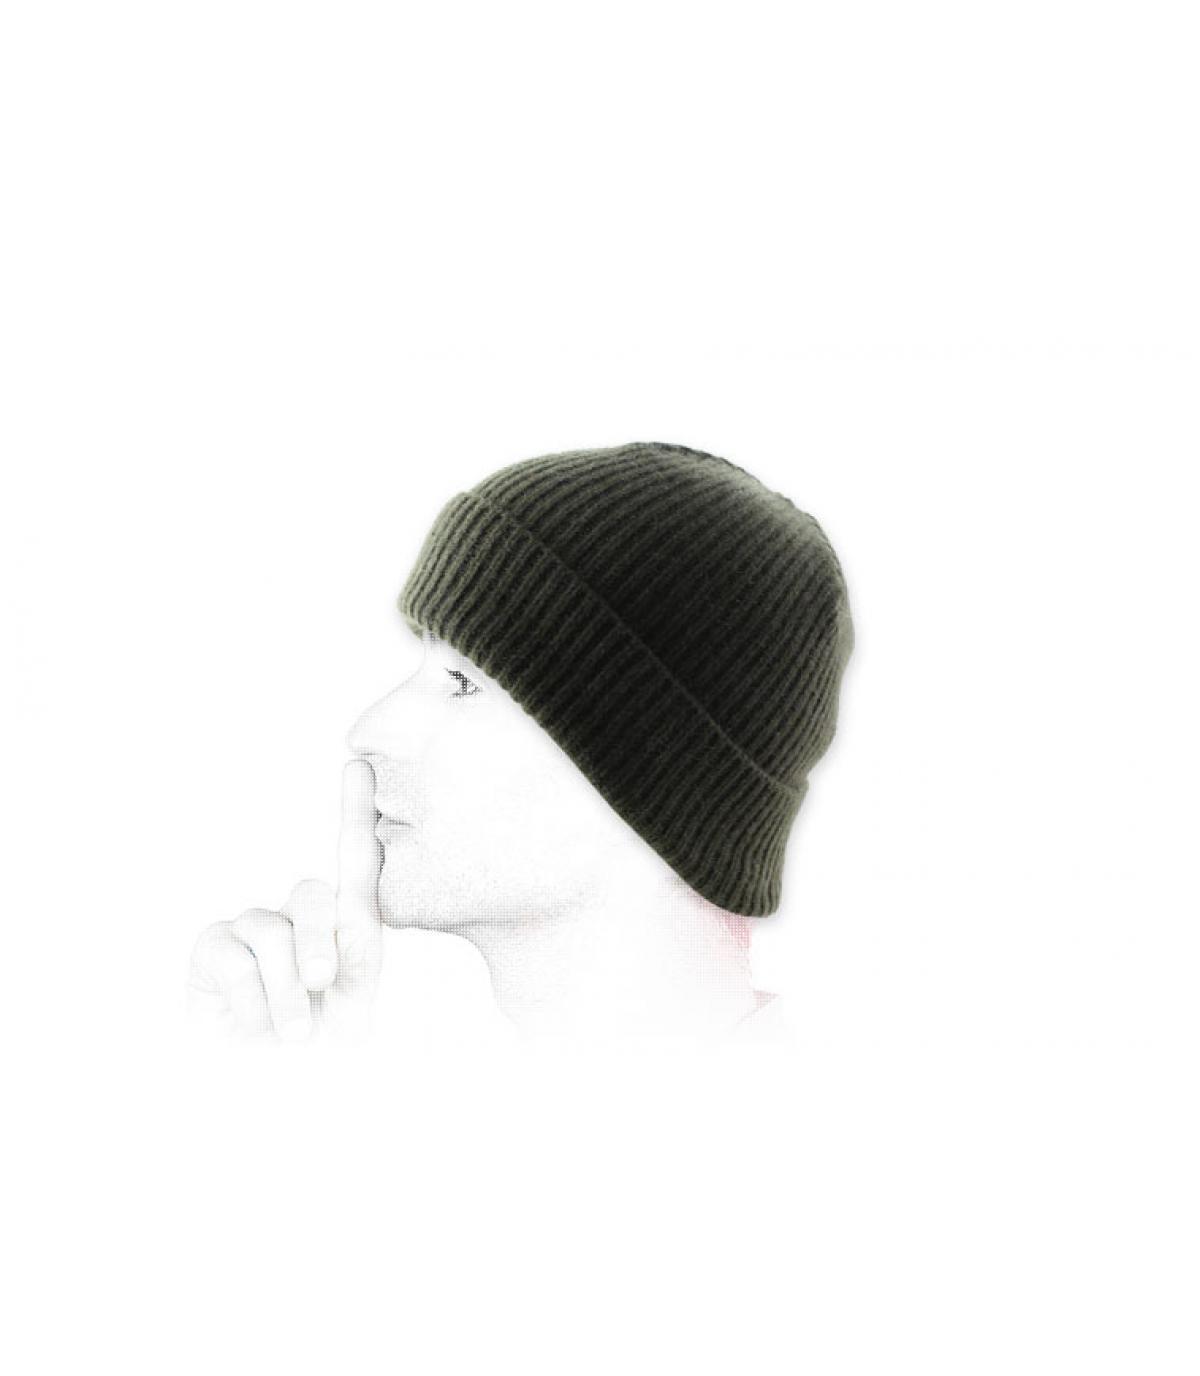 lana verde cappello bavero